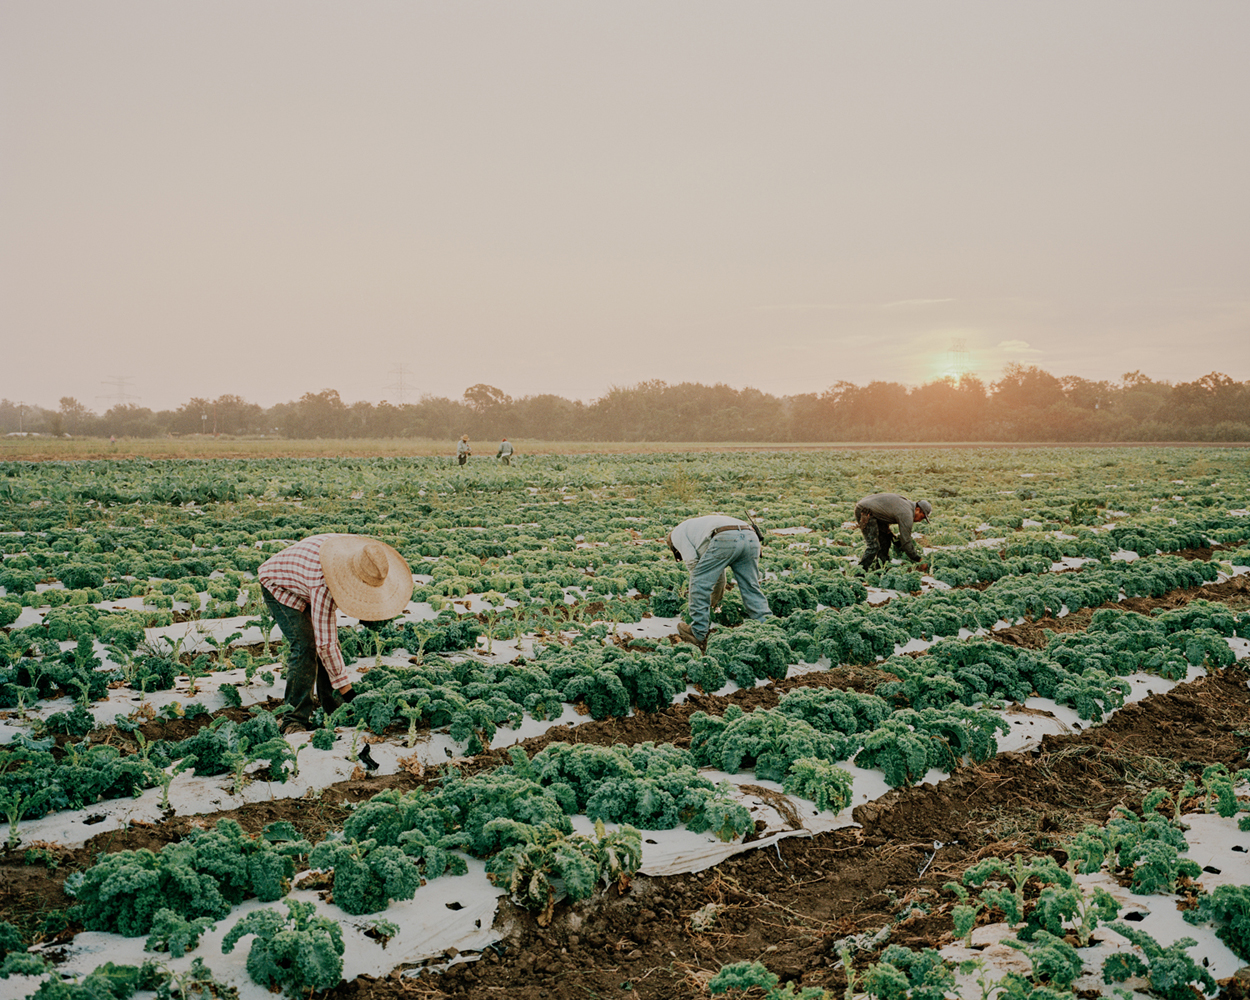 Texas farm workers